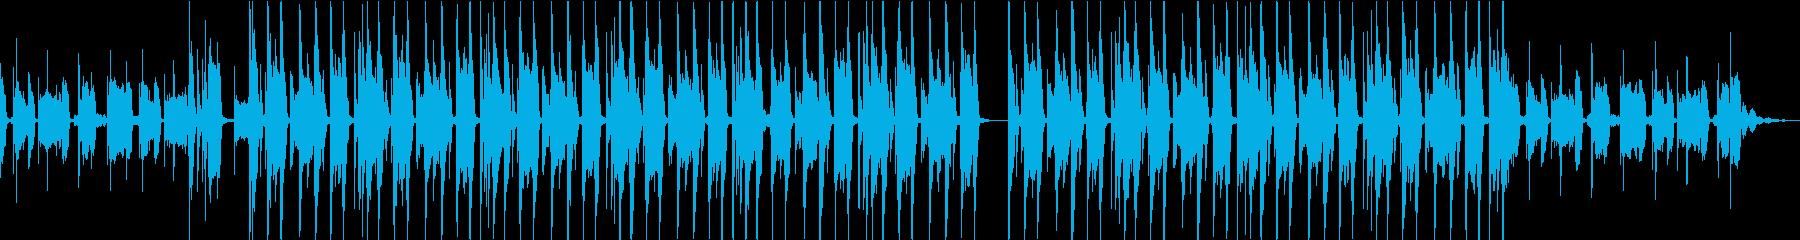 CMで使えるおしゃれBGMの再生済みの波形